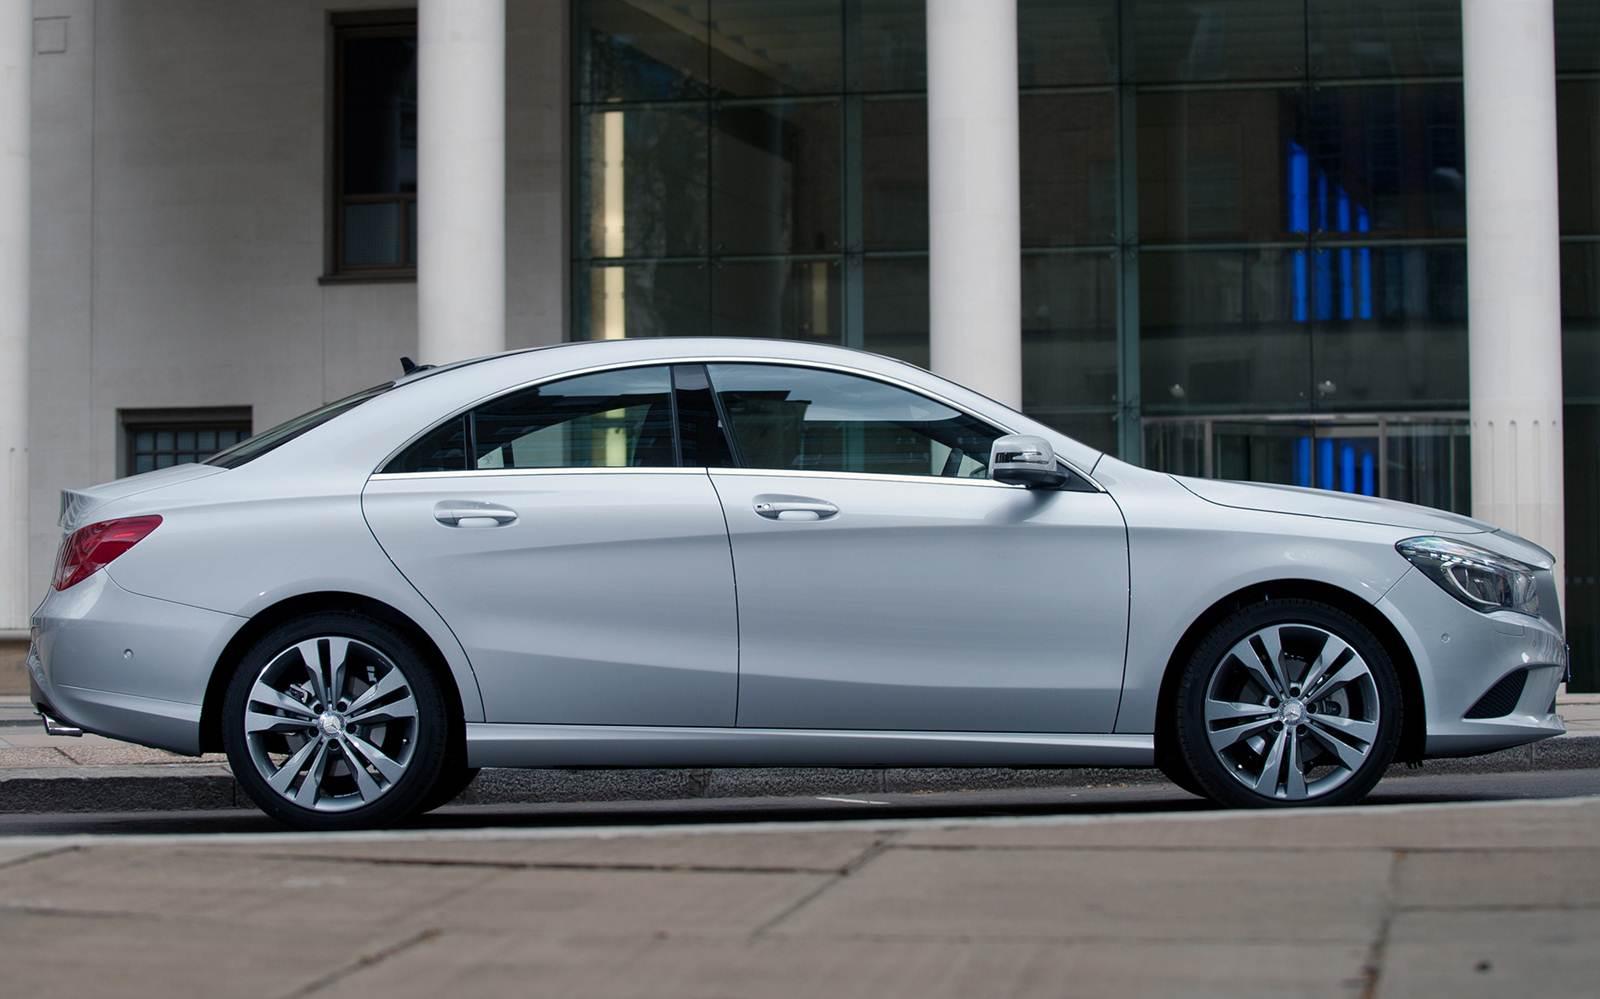 Audi A3 Sedan X Mercedes Cla Empate De Vendas Nos Eua